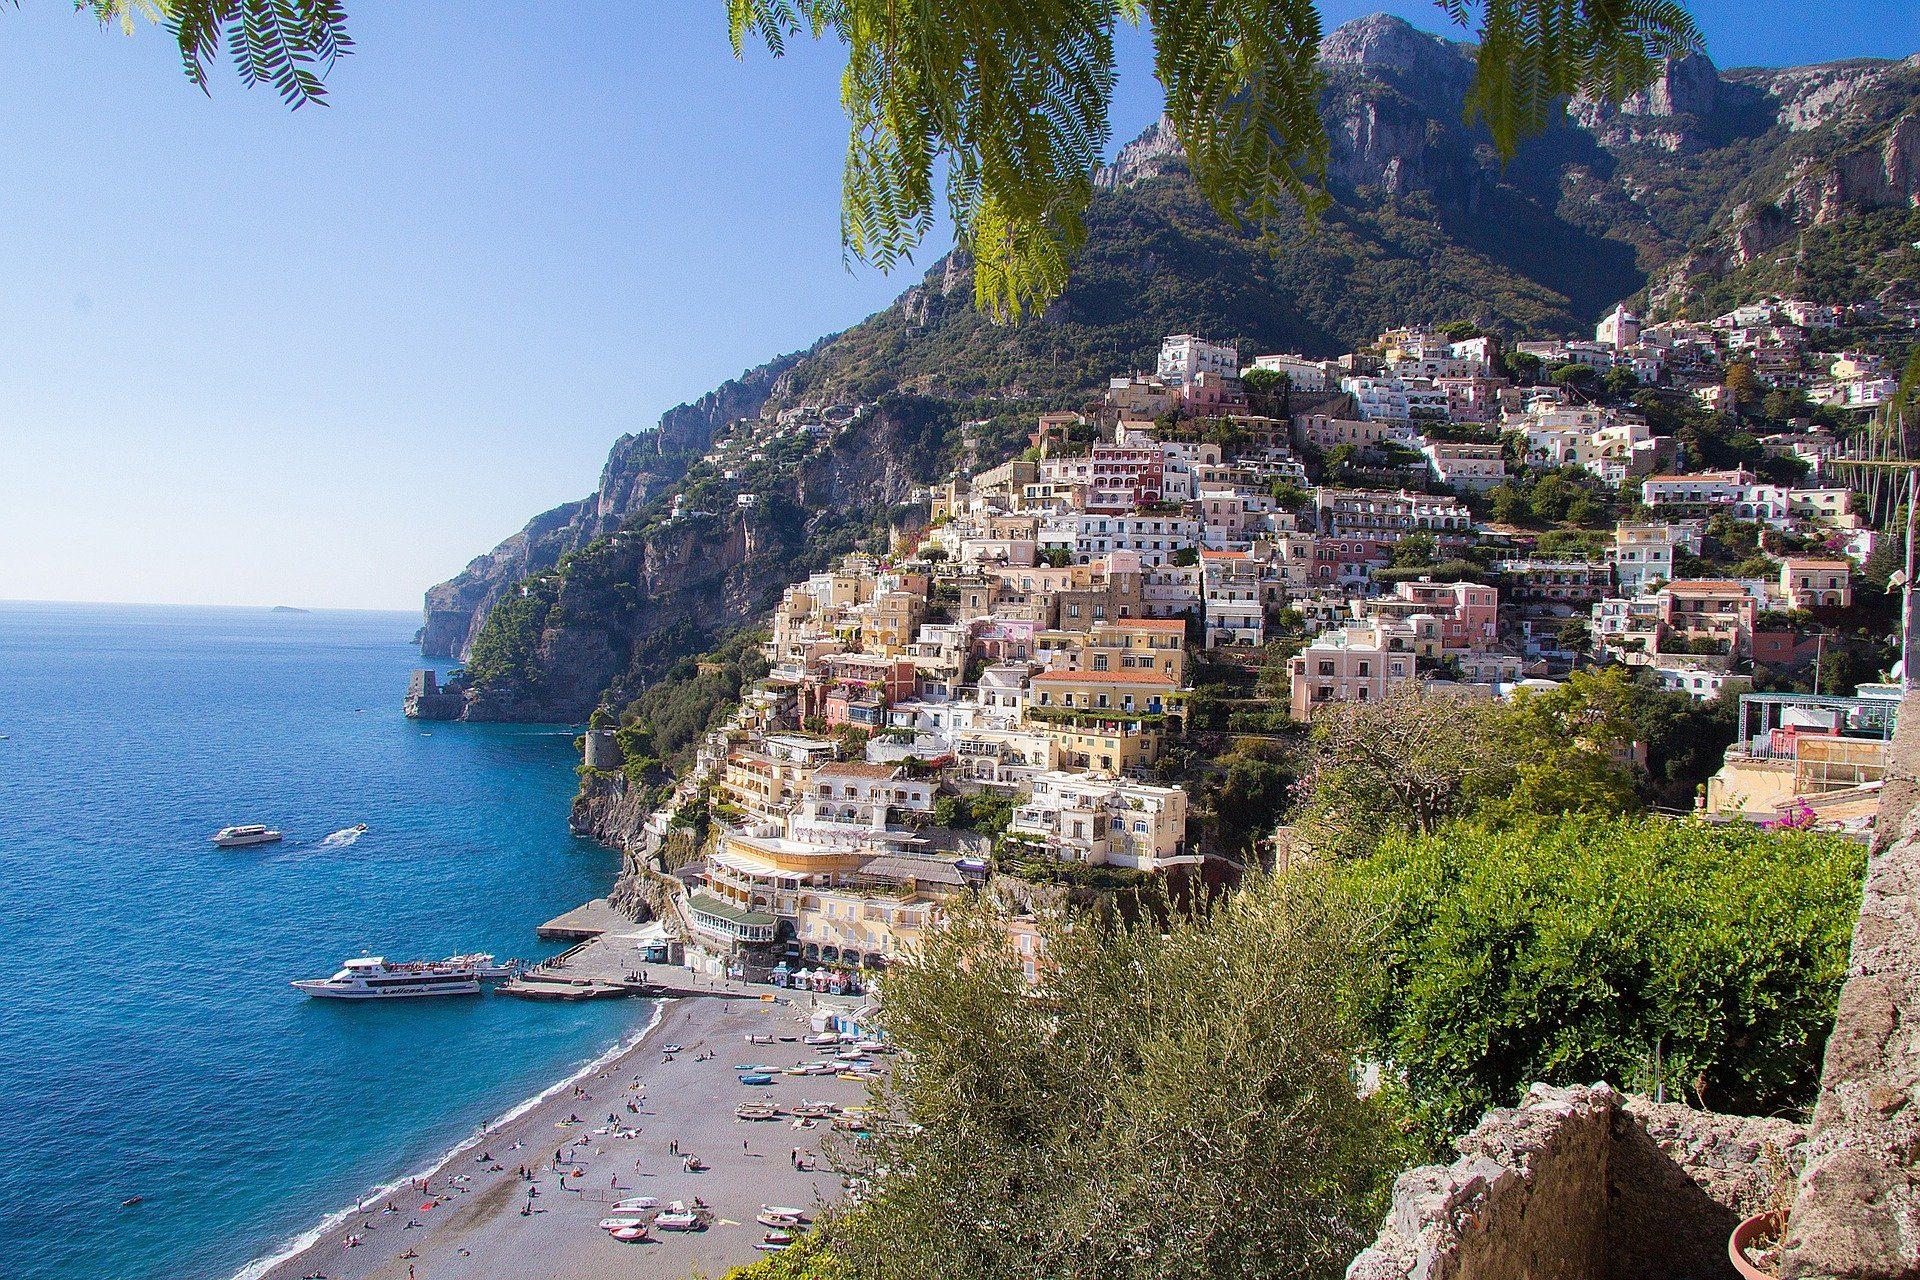 side view of the Amalfi coast